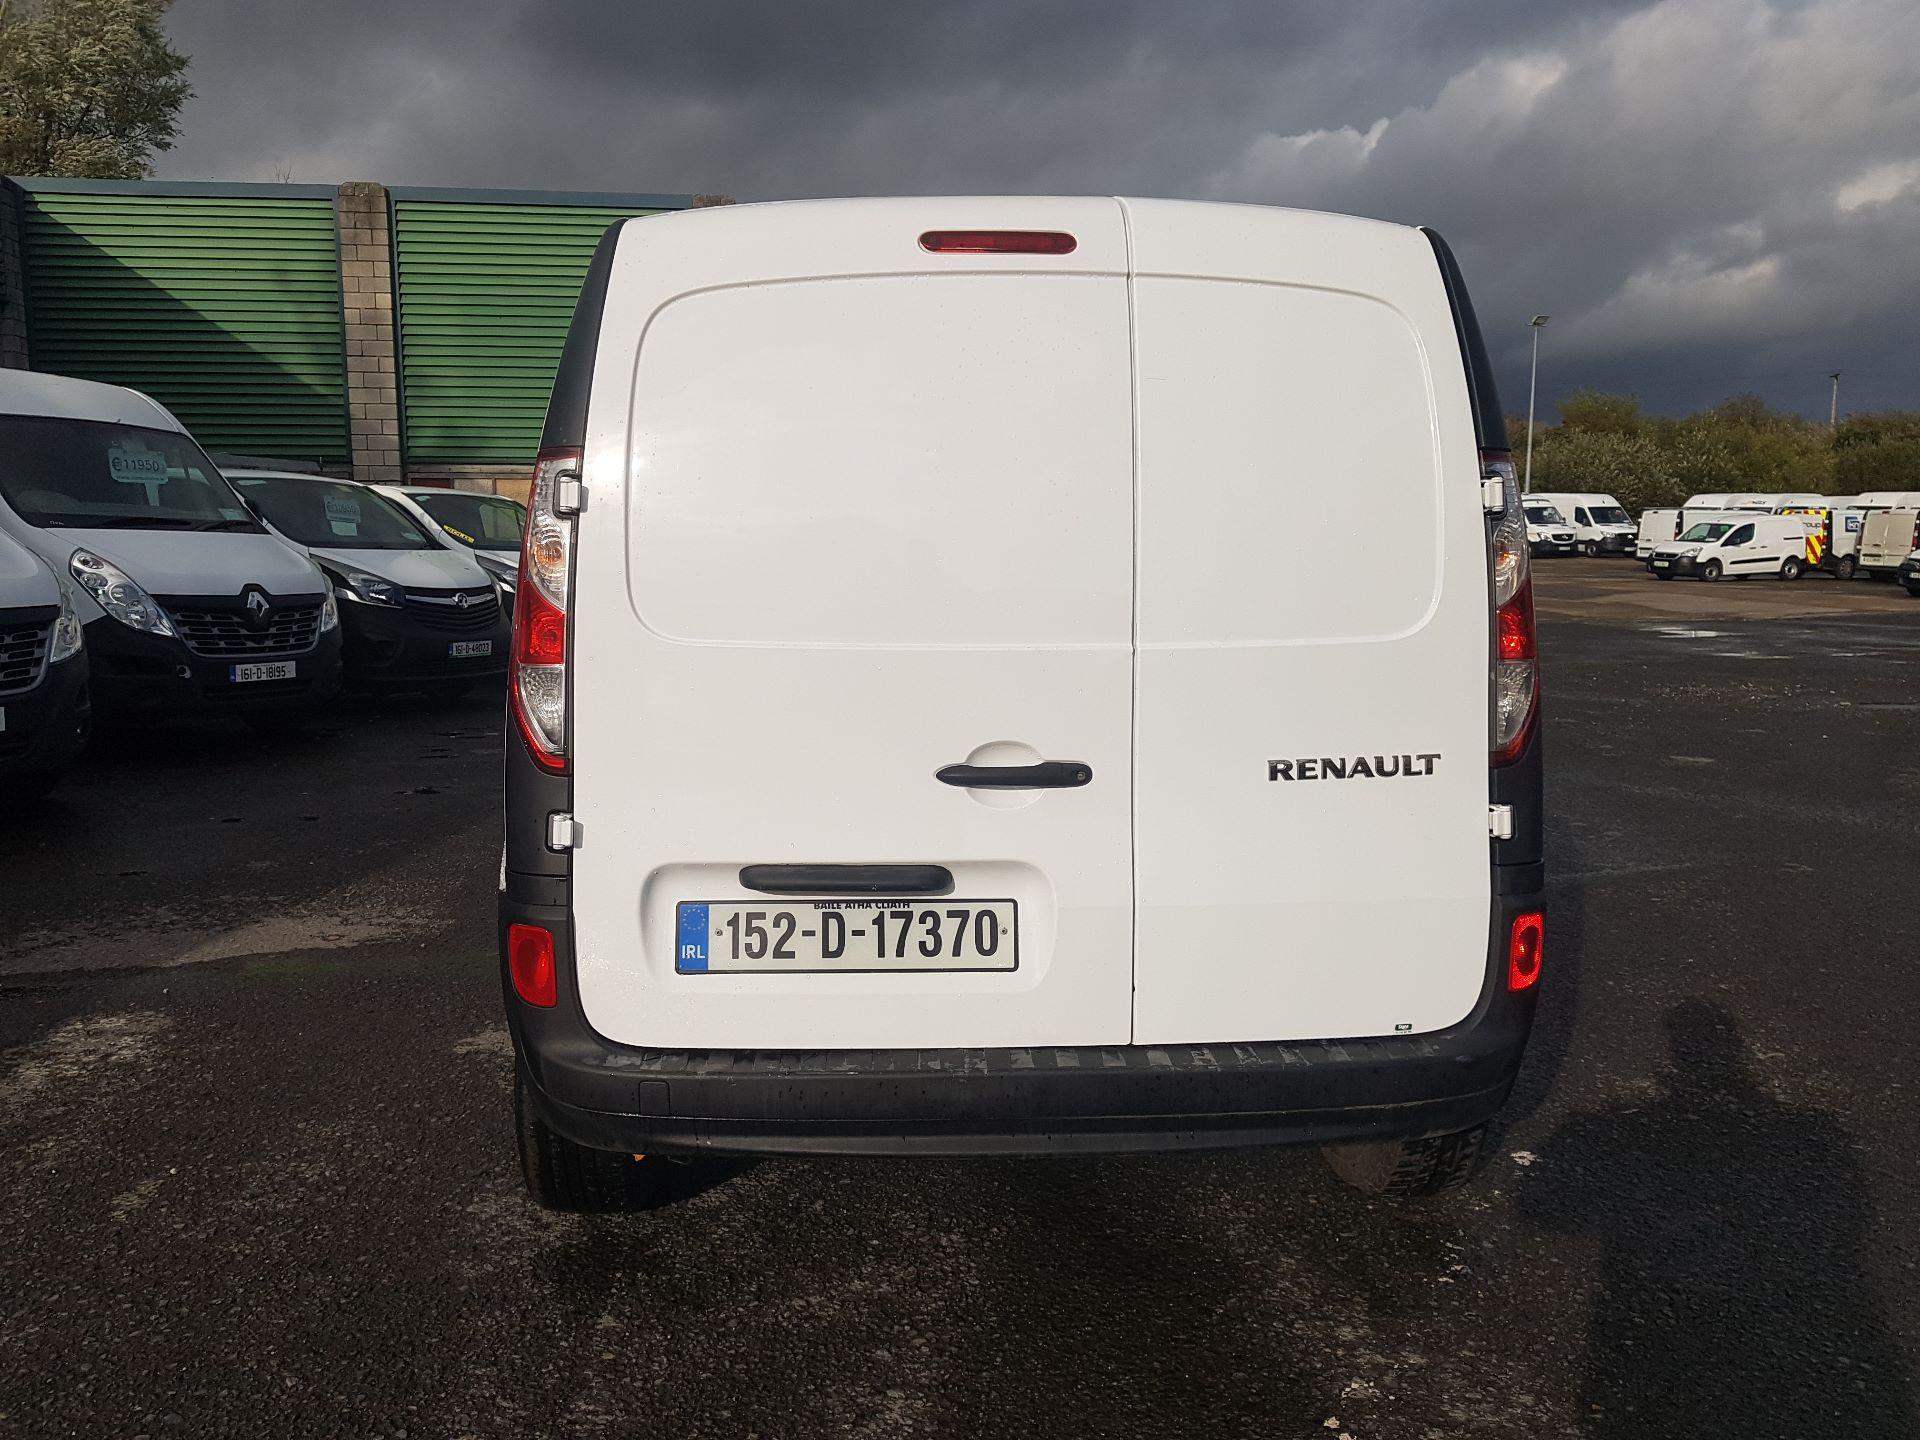 2015 Renault Kangoo 1.5 DCI 75BHP 2015 2DR (152D17370) Image 5